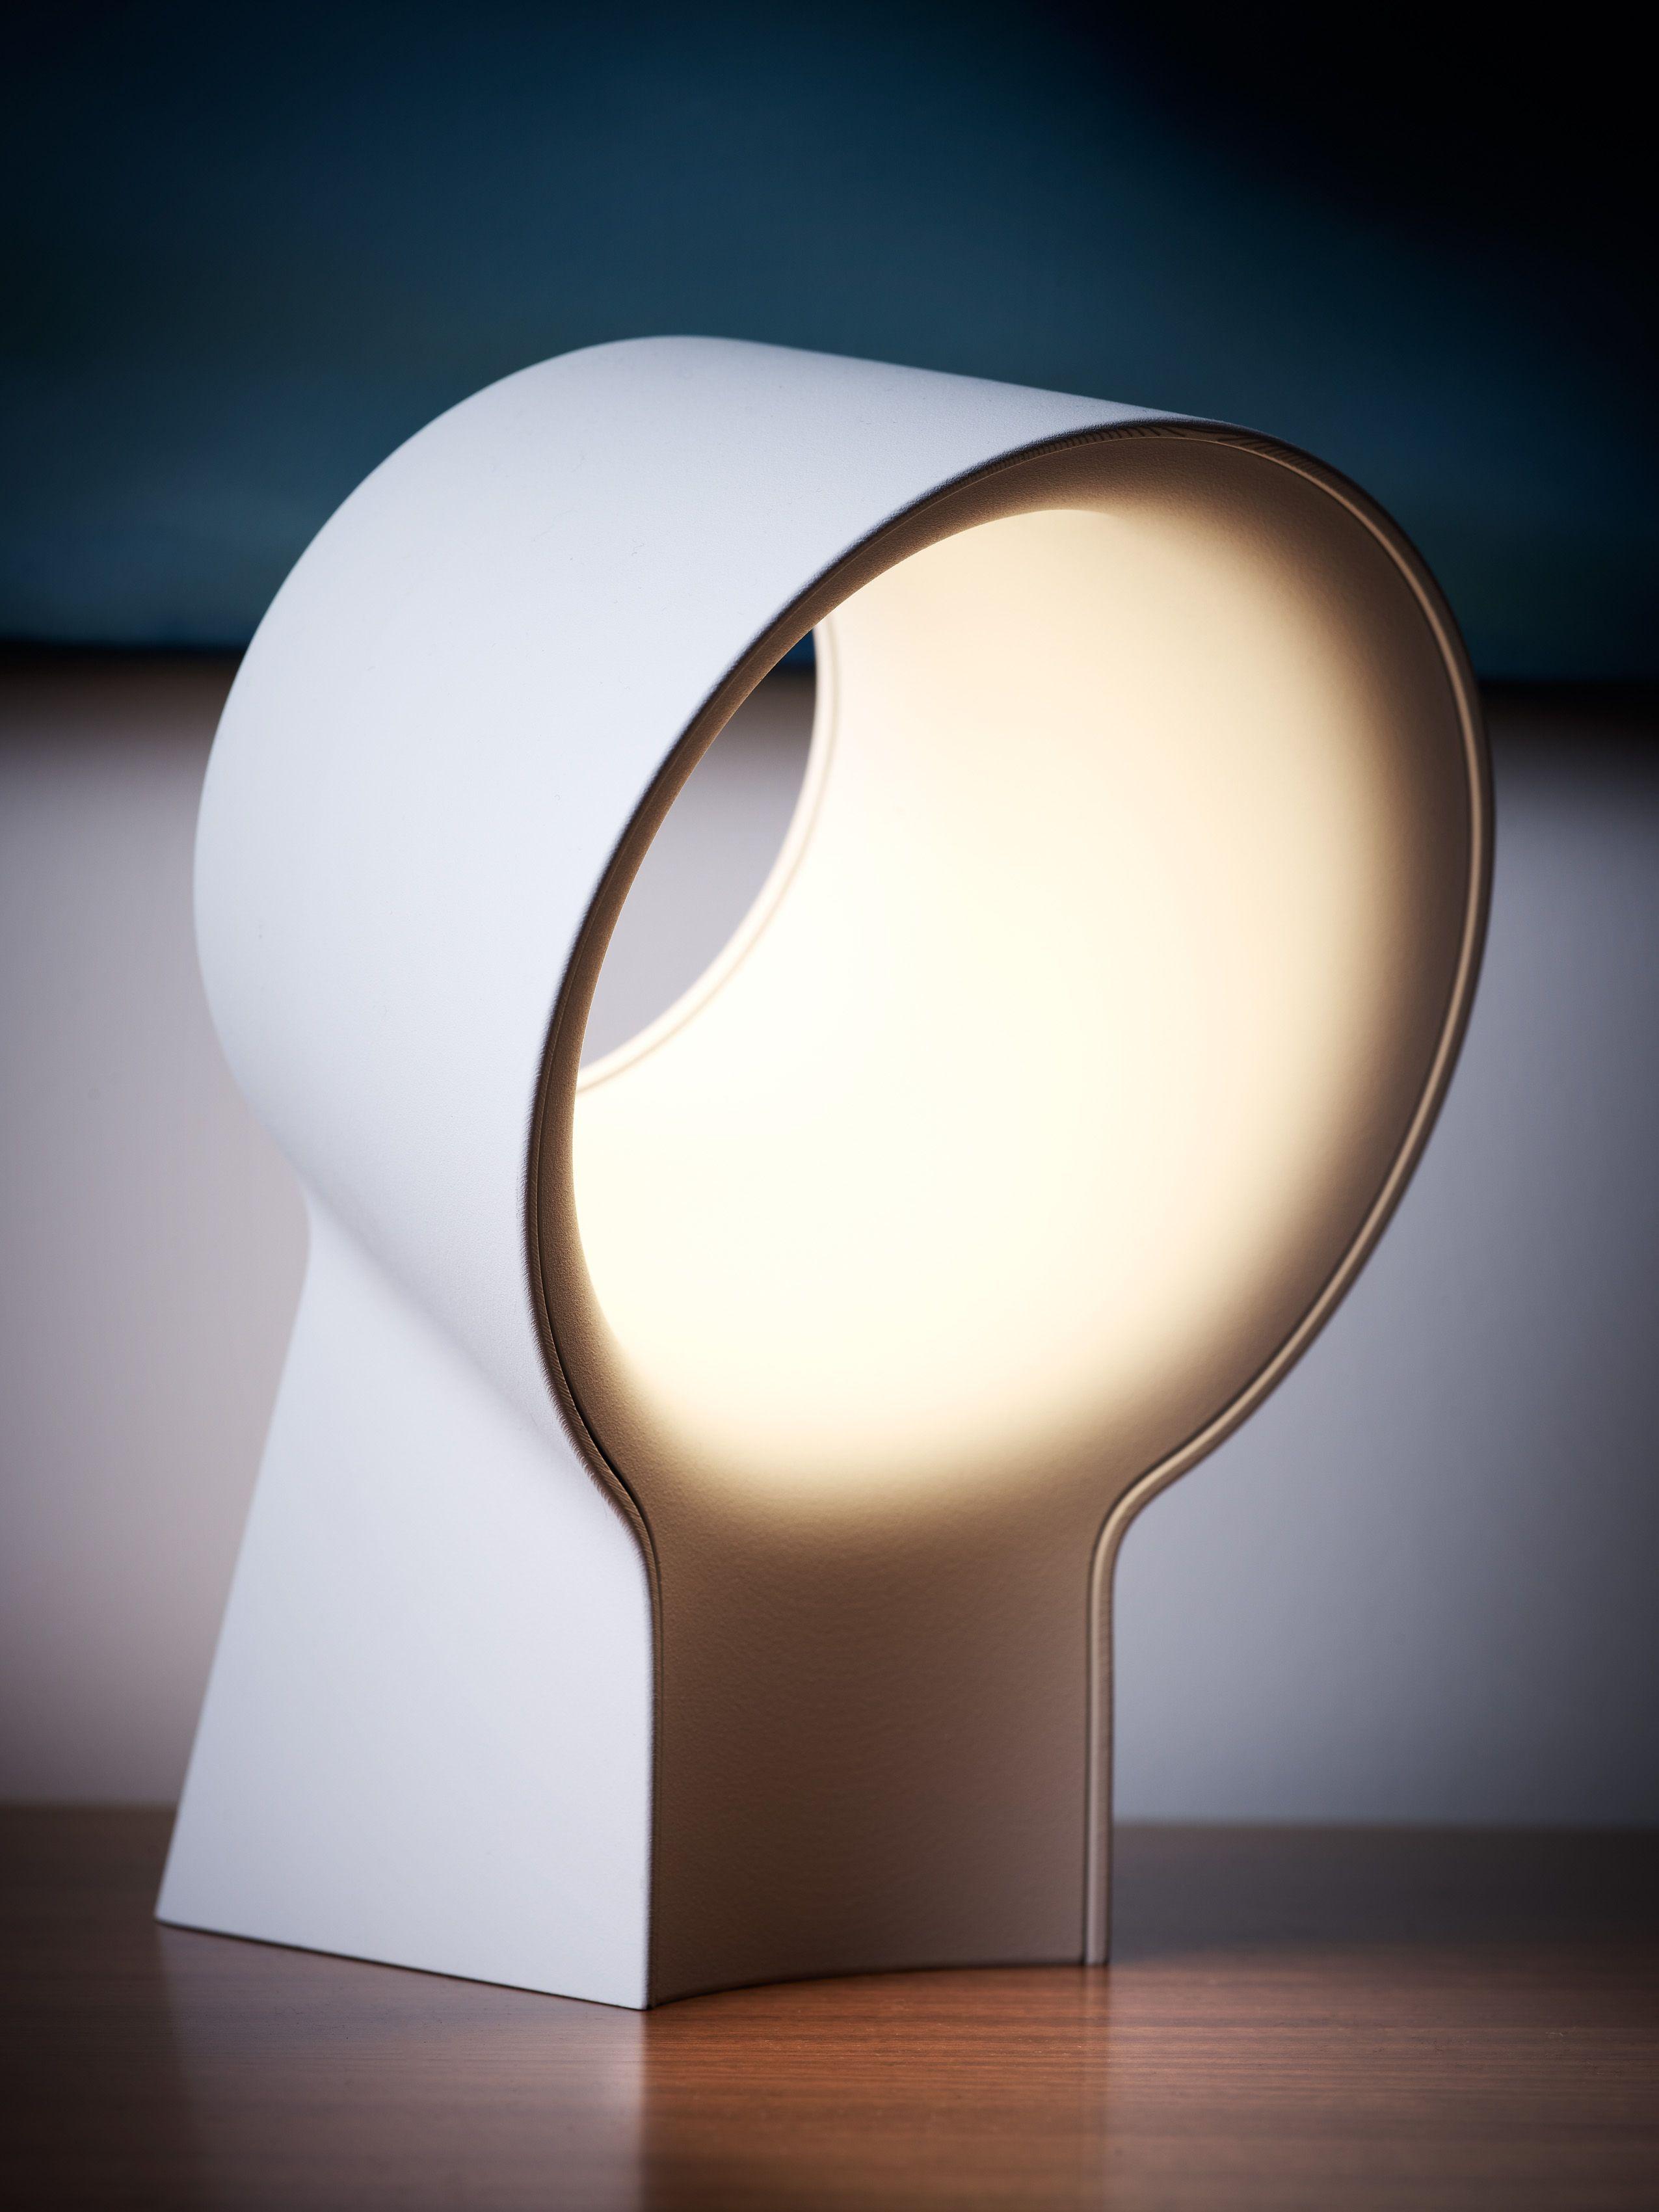 La lampe LENTE de Philips | DESIGN : Furniture + Products + Lighting ...